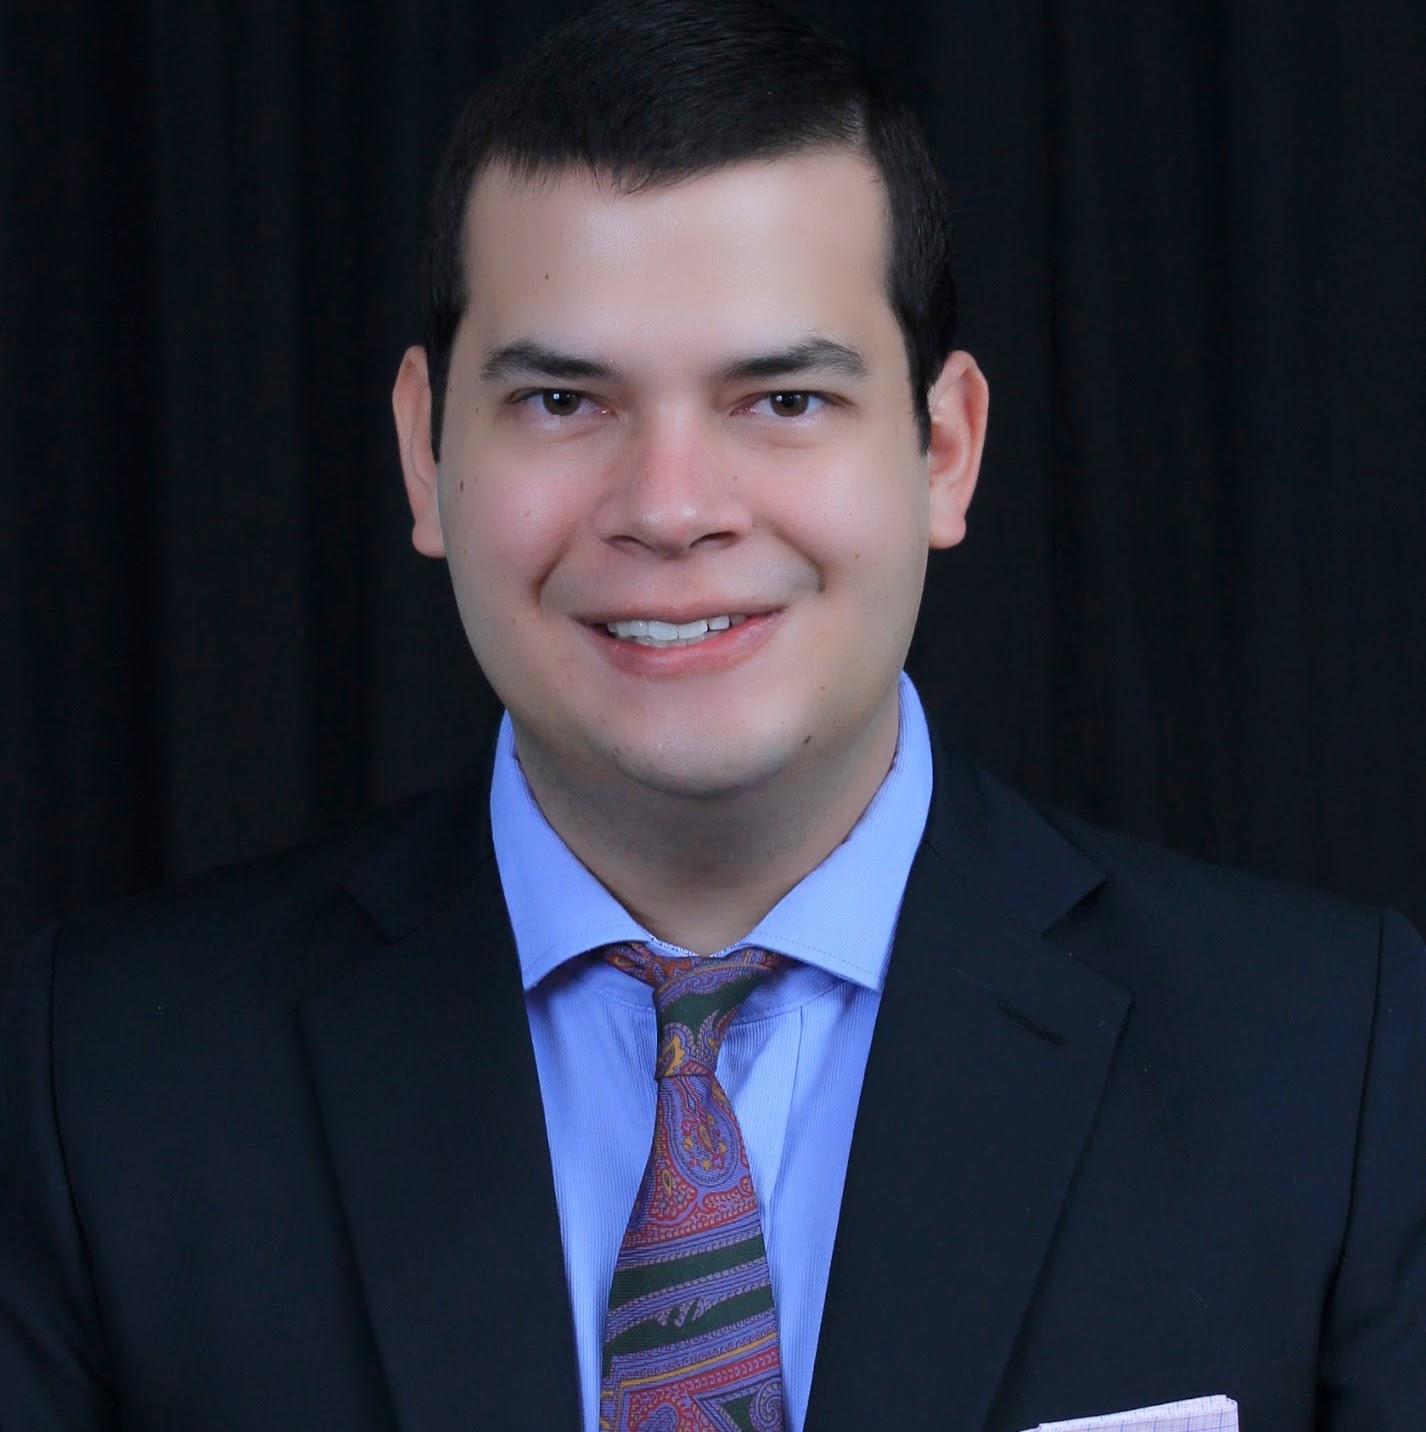 Diego Solis